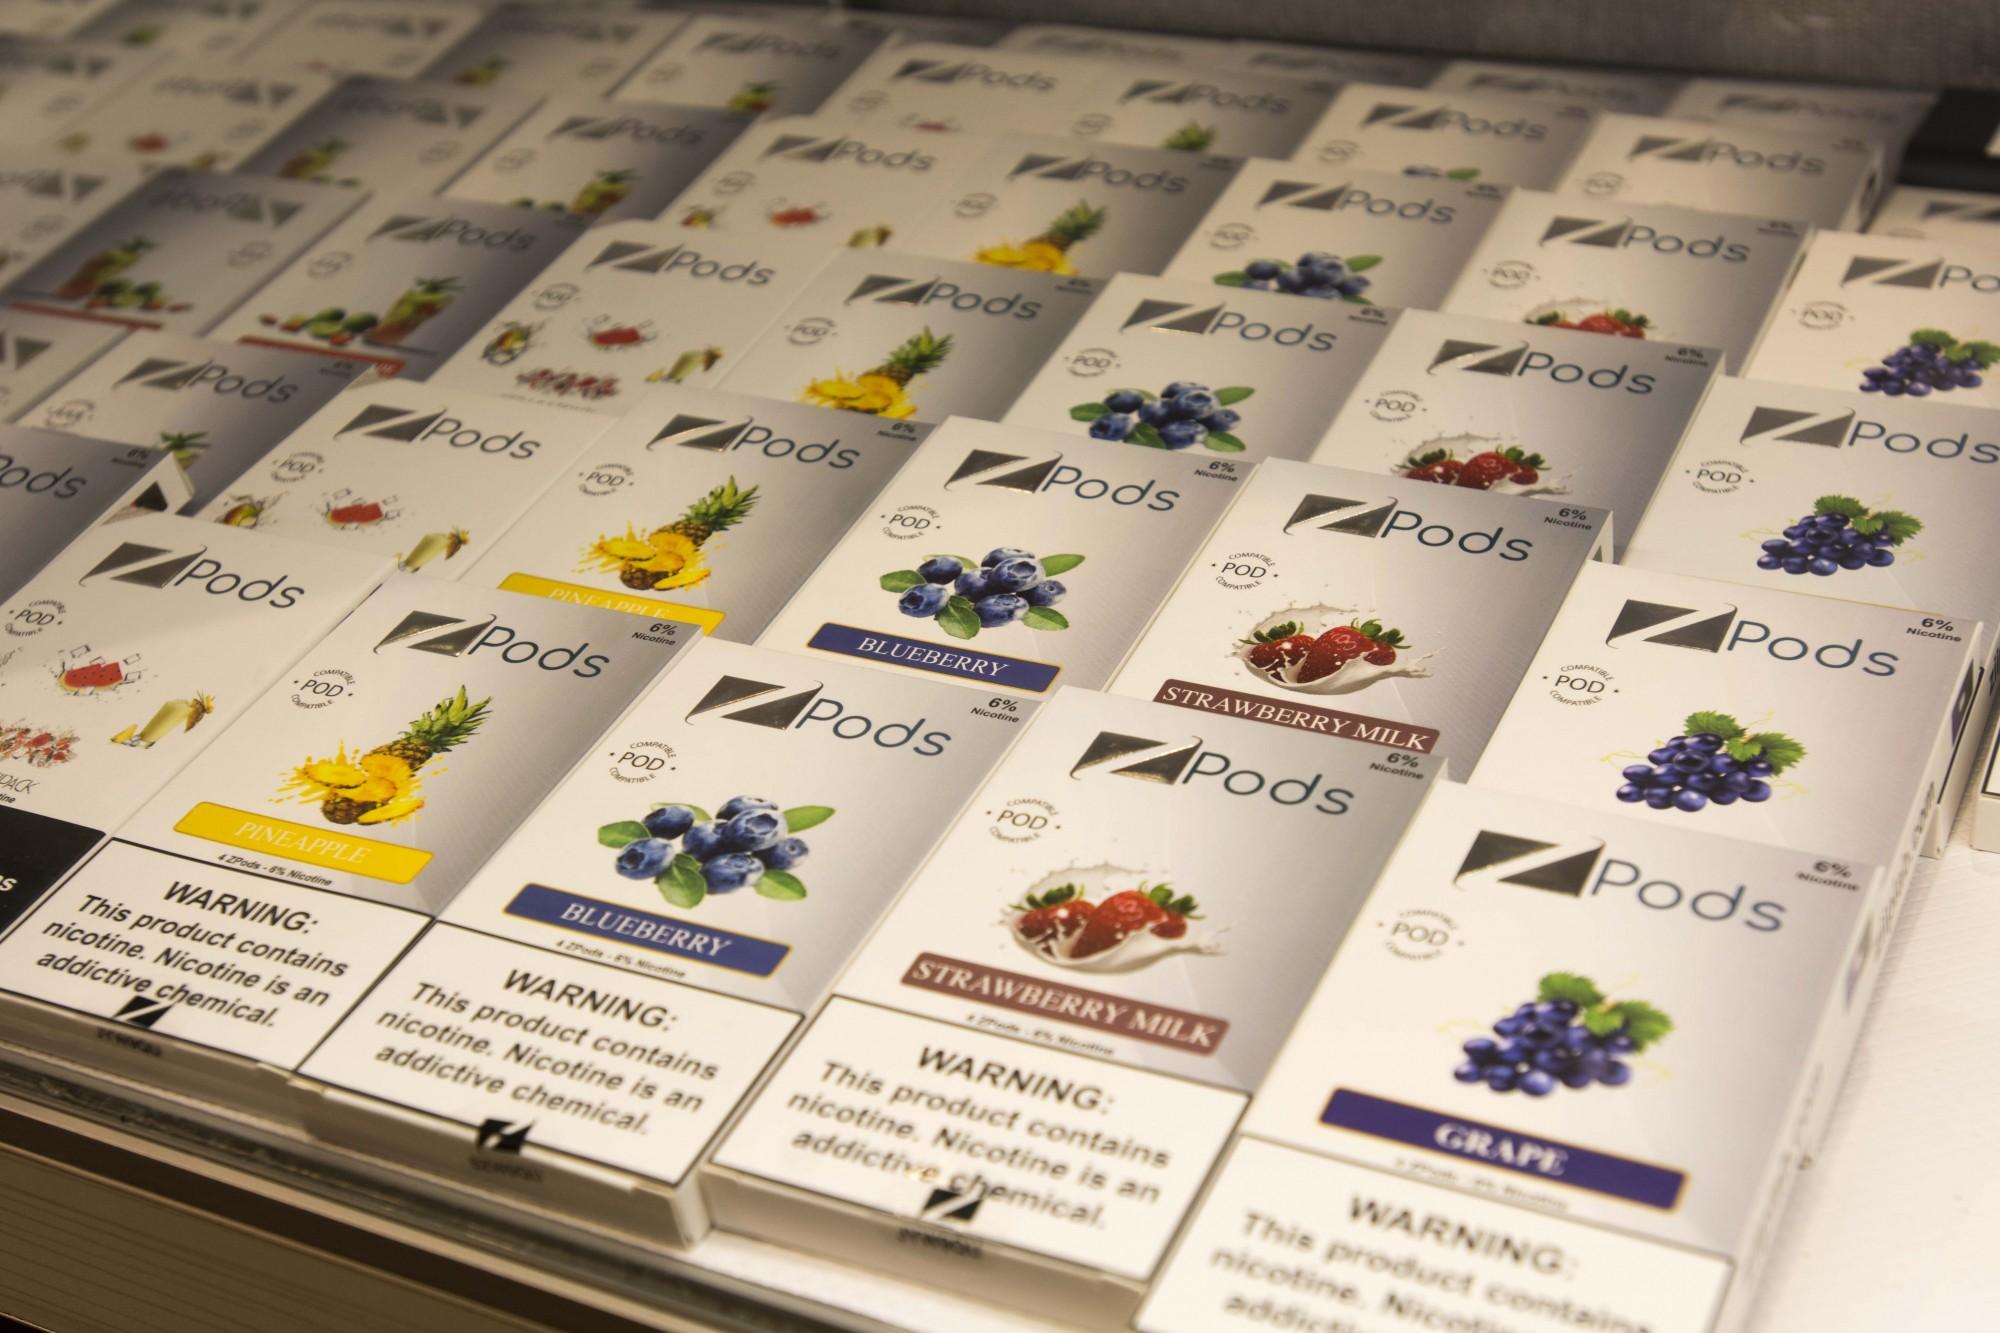 Flavored vape pods seen on display in Hideaway in Dinkytown on Friday, Nov. 8.